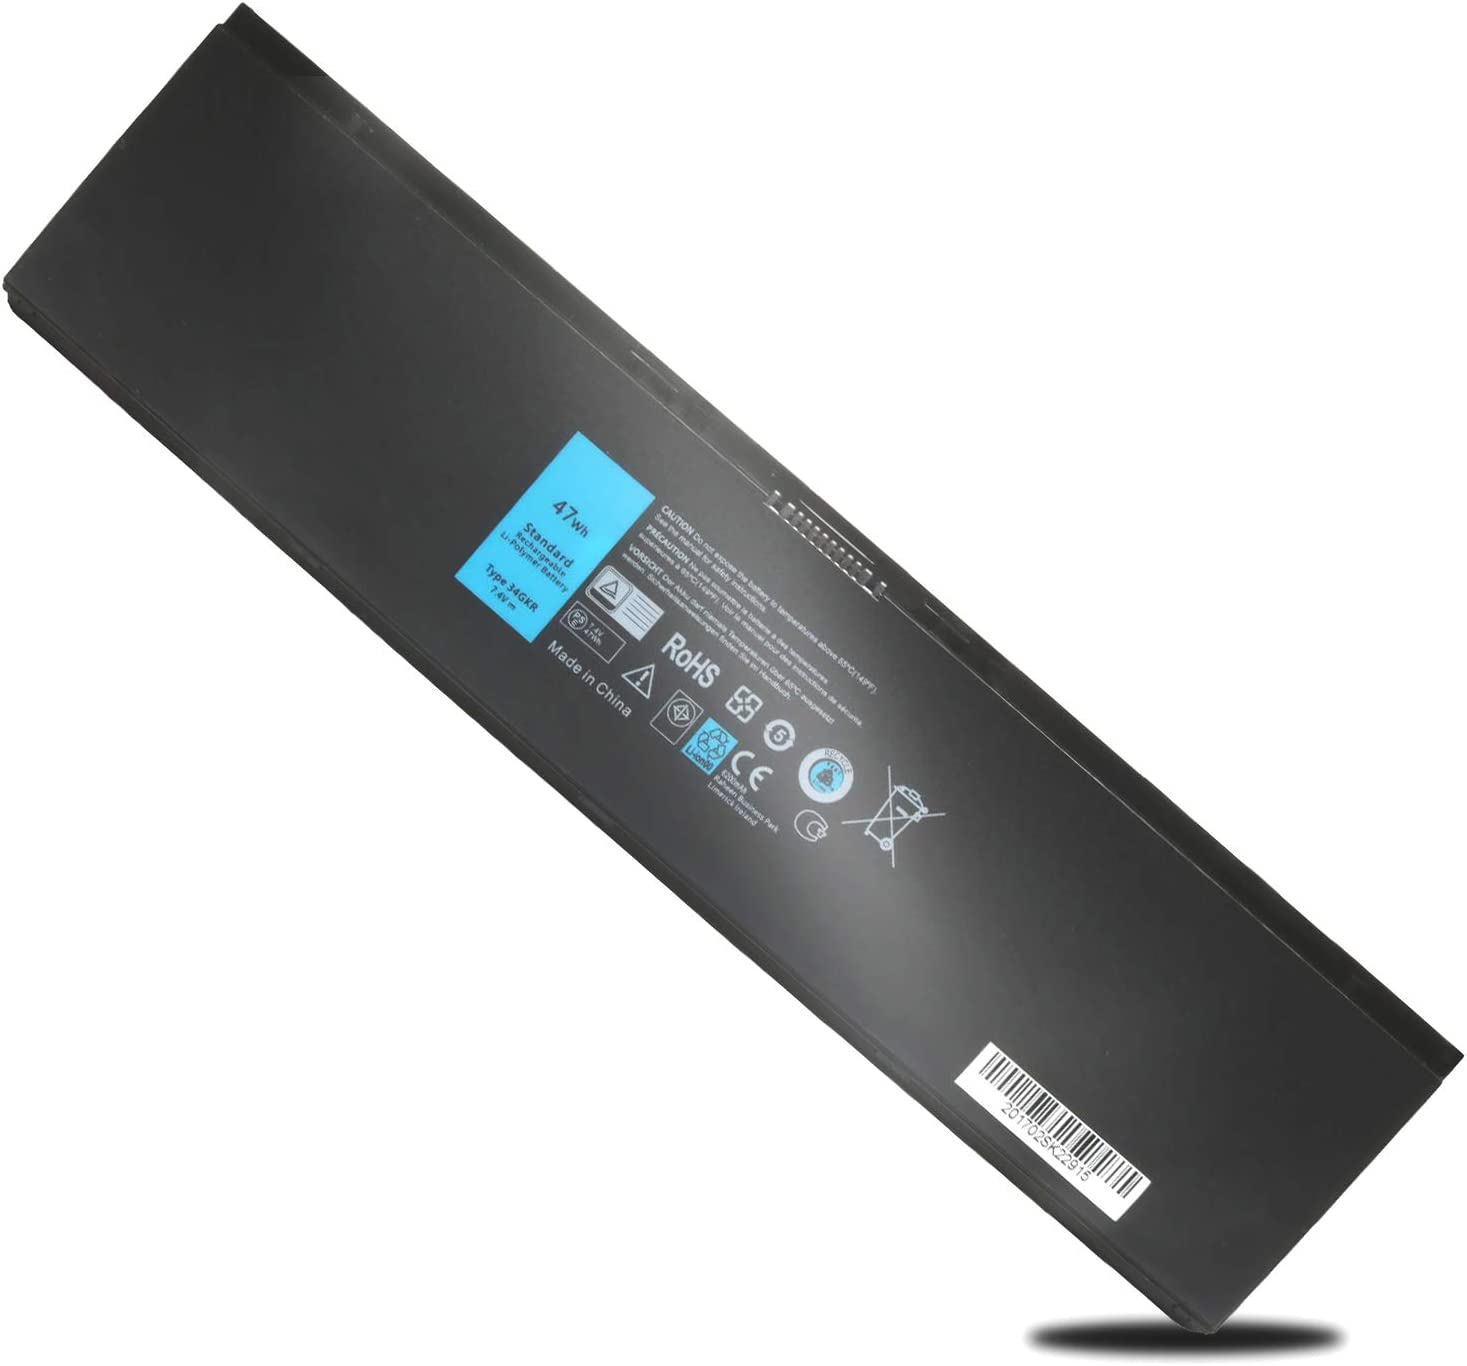 Latitude E7440 E7450 Laptop Battery 7.4V 47WH Replacement for Dell Latitude E7420 7440 7450 G0G2M 451-BBFV 34GKR PFXCR T19VW 451-BBFV G95J5 E225846 909H5 3RNFD Latitude 7000 Ultrabook Battery